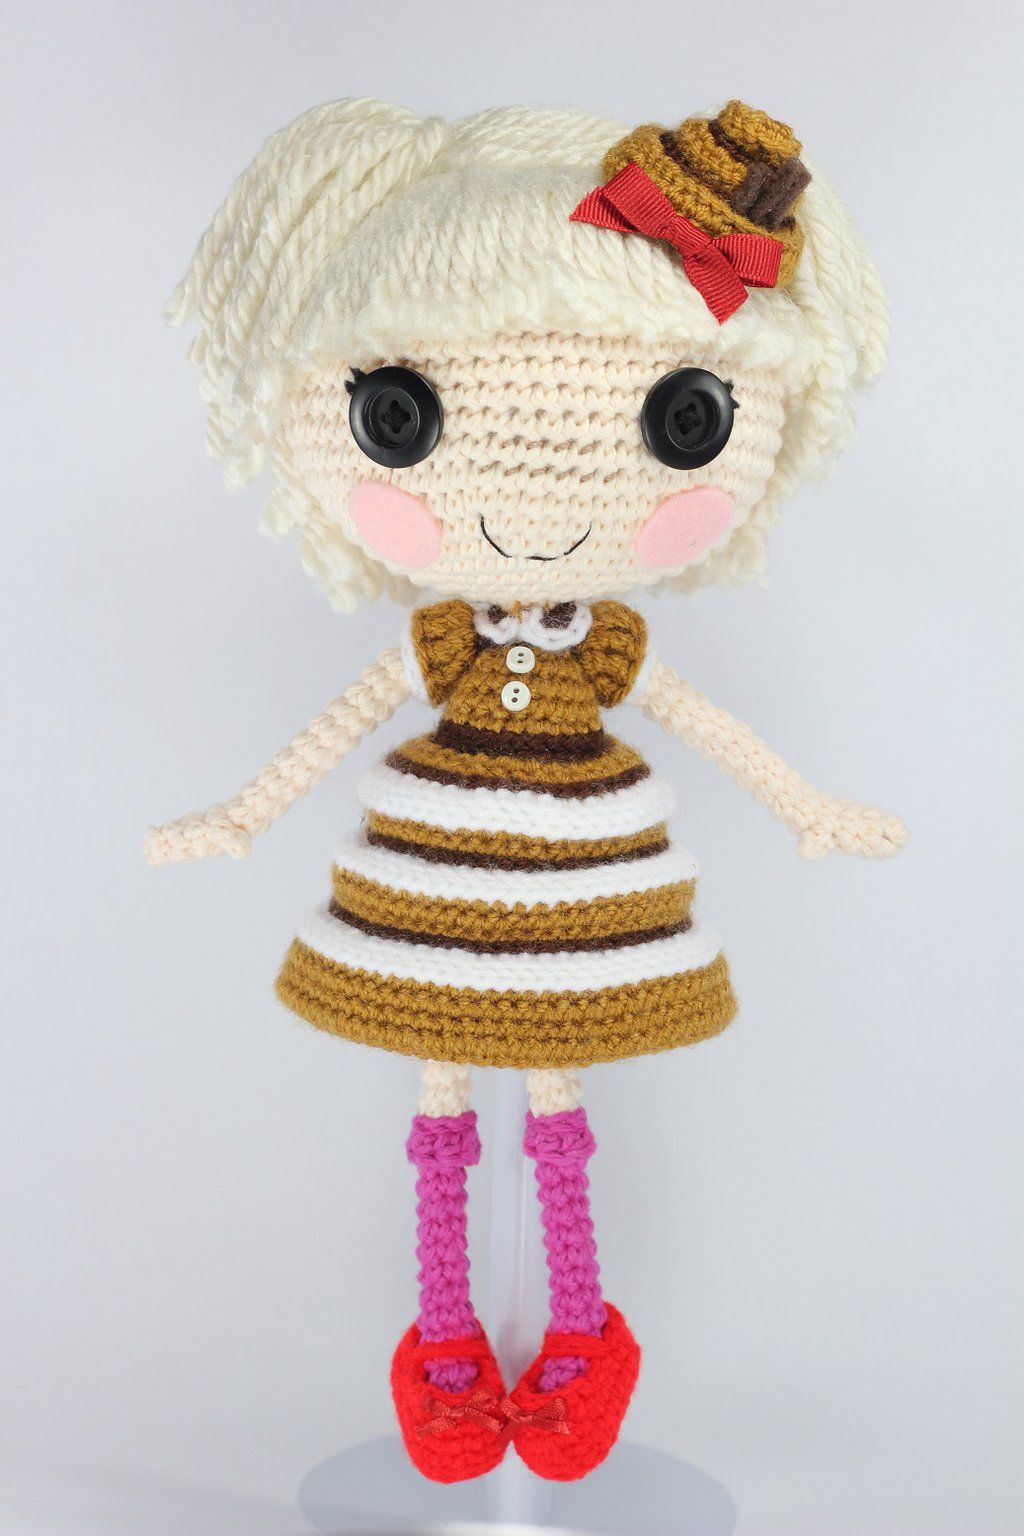 Amigurumi Doll Lalaloopsy : LALALOOPSY Bun Bun Sticky Icing Amigurumi Doll by Npantz22 ...